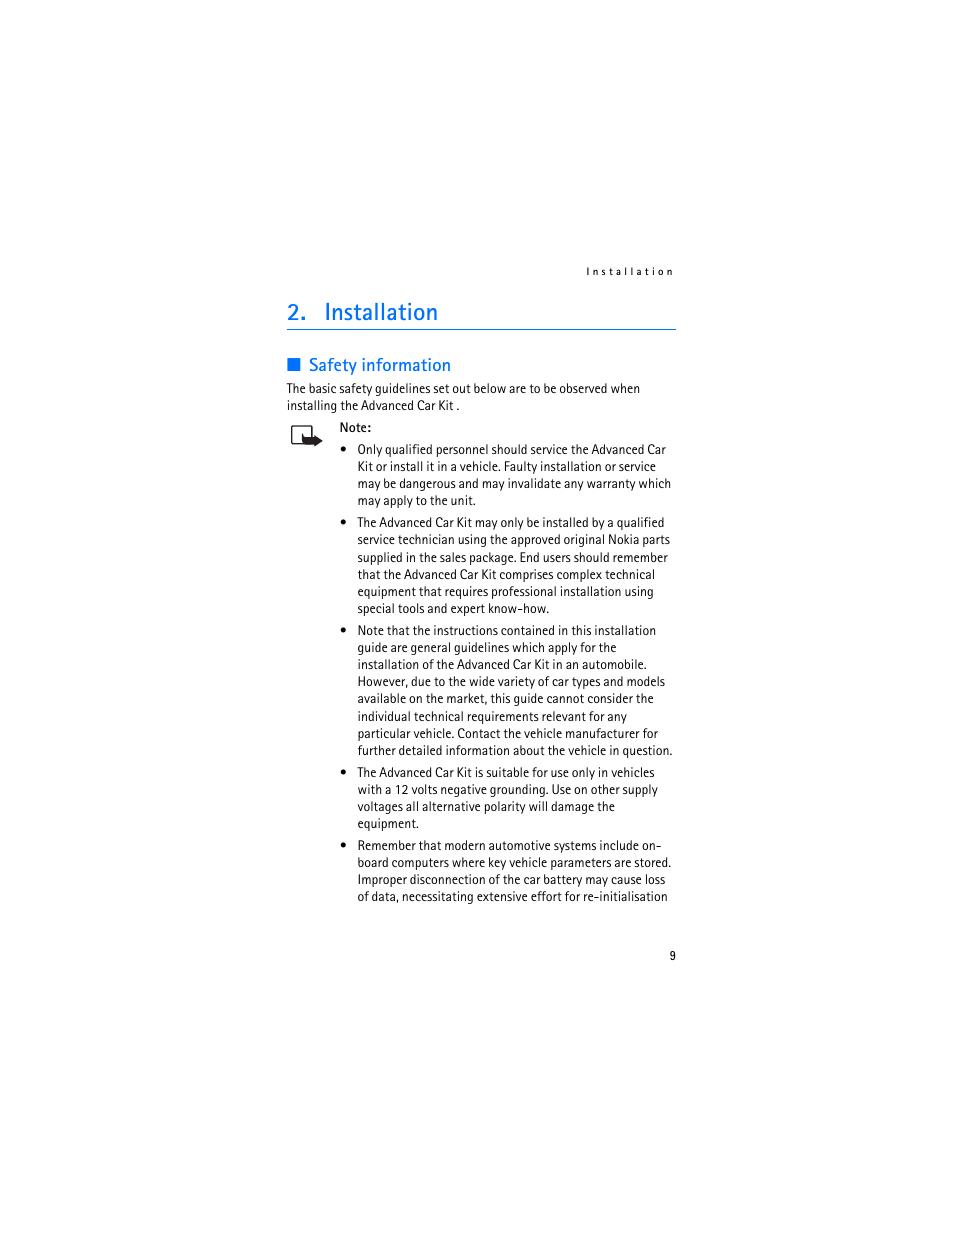 Installation Safety Information Nokia Advanced Car Kit Ck 7w User